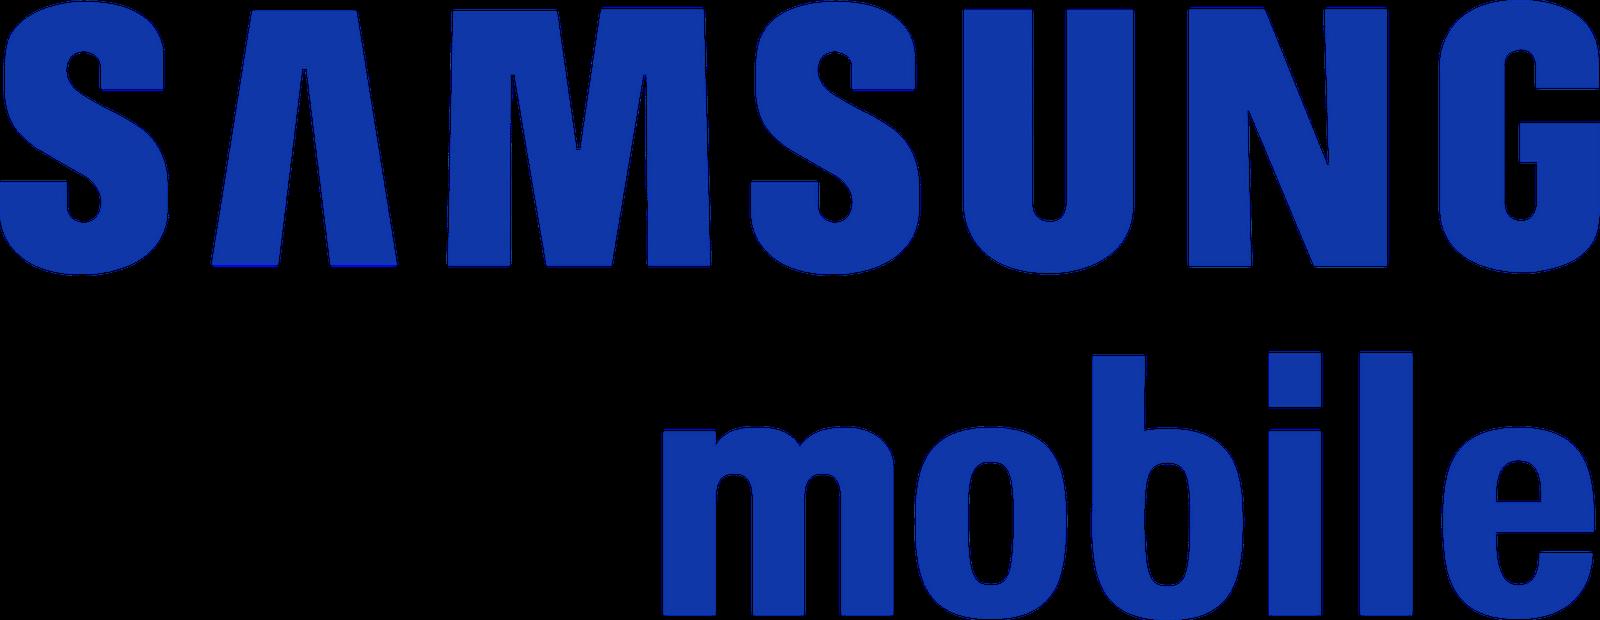 FH Logo: Samsung Mobile